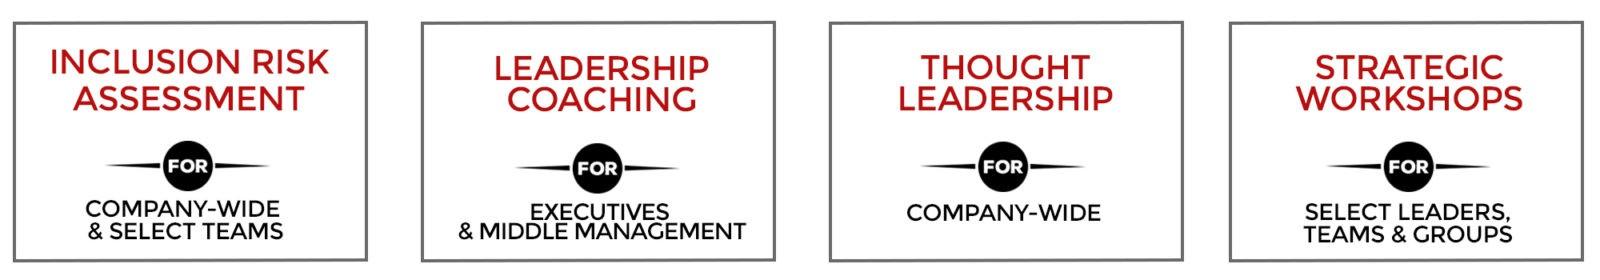 WORKSHOPS, RISK ASSESSMENT, LEADERSHIP